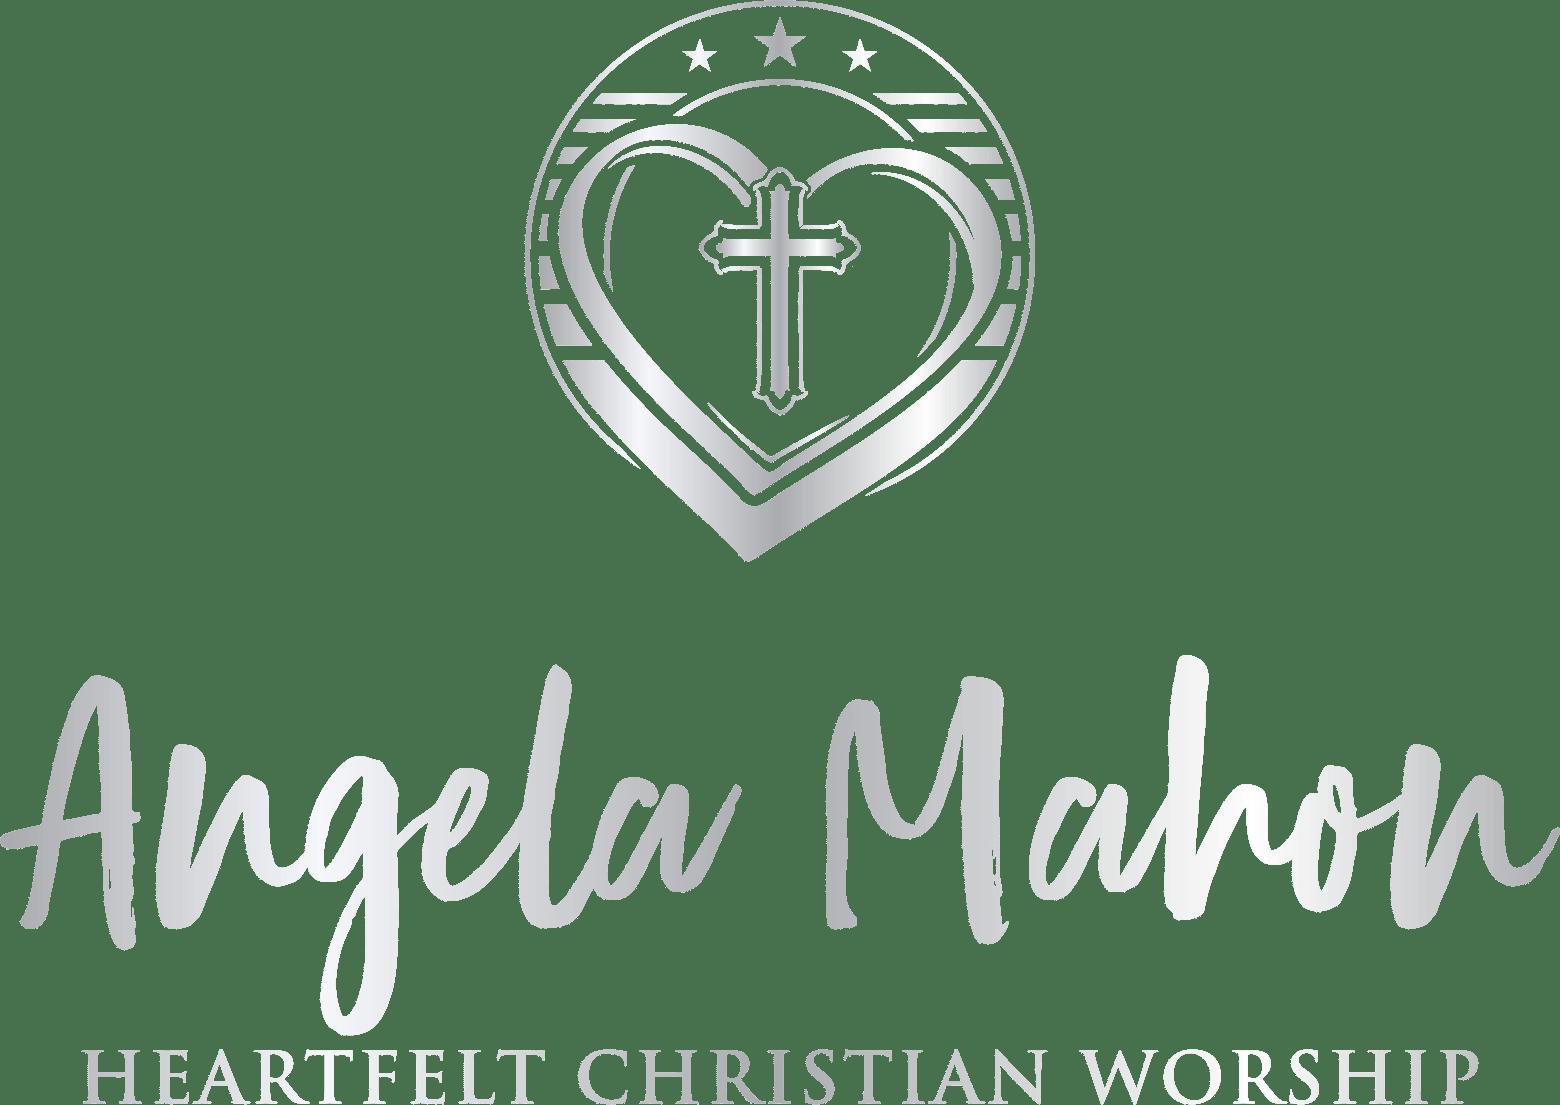 Angela Mahon sliver logo